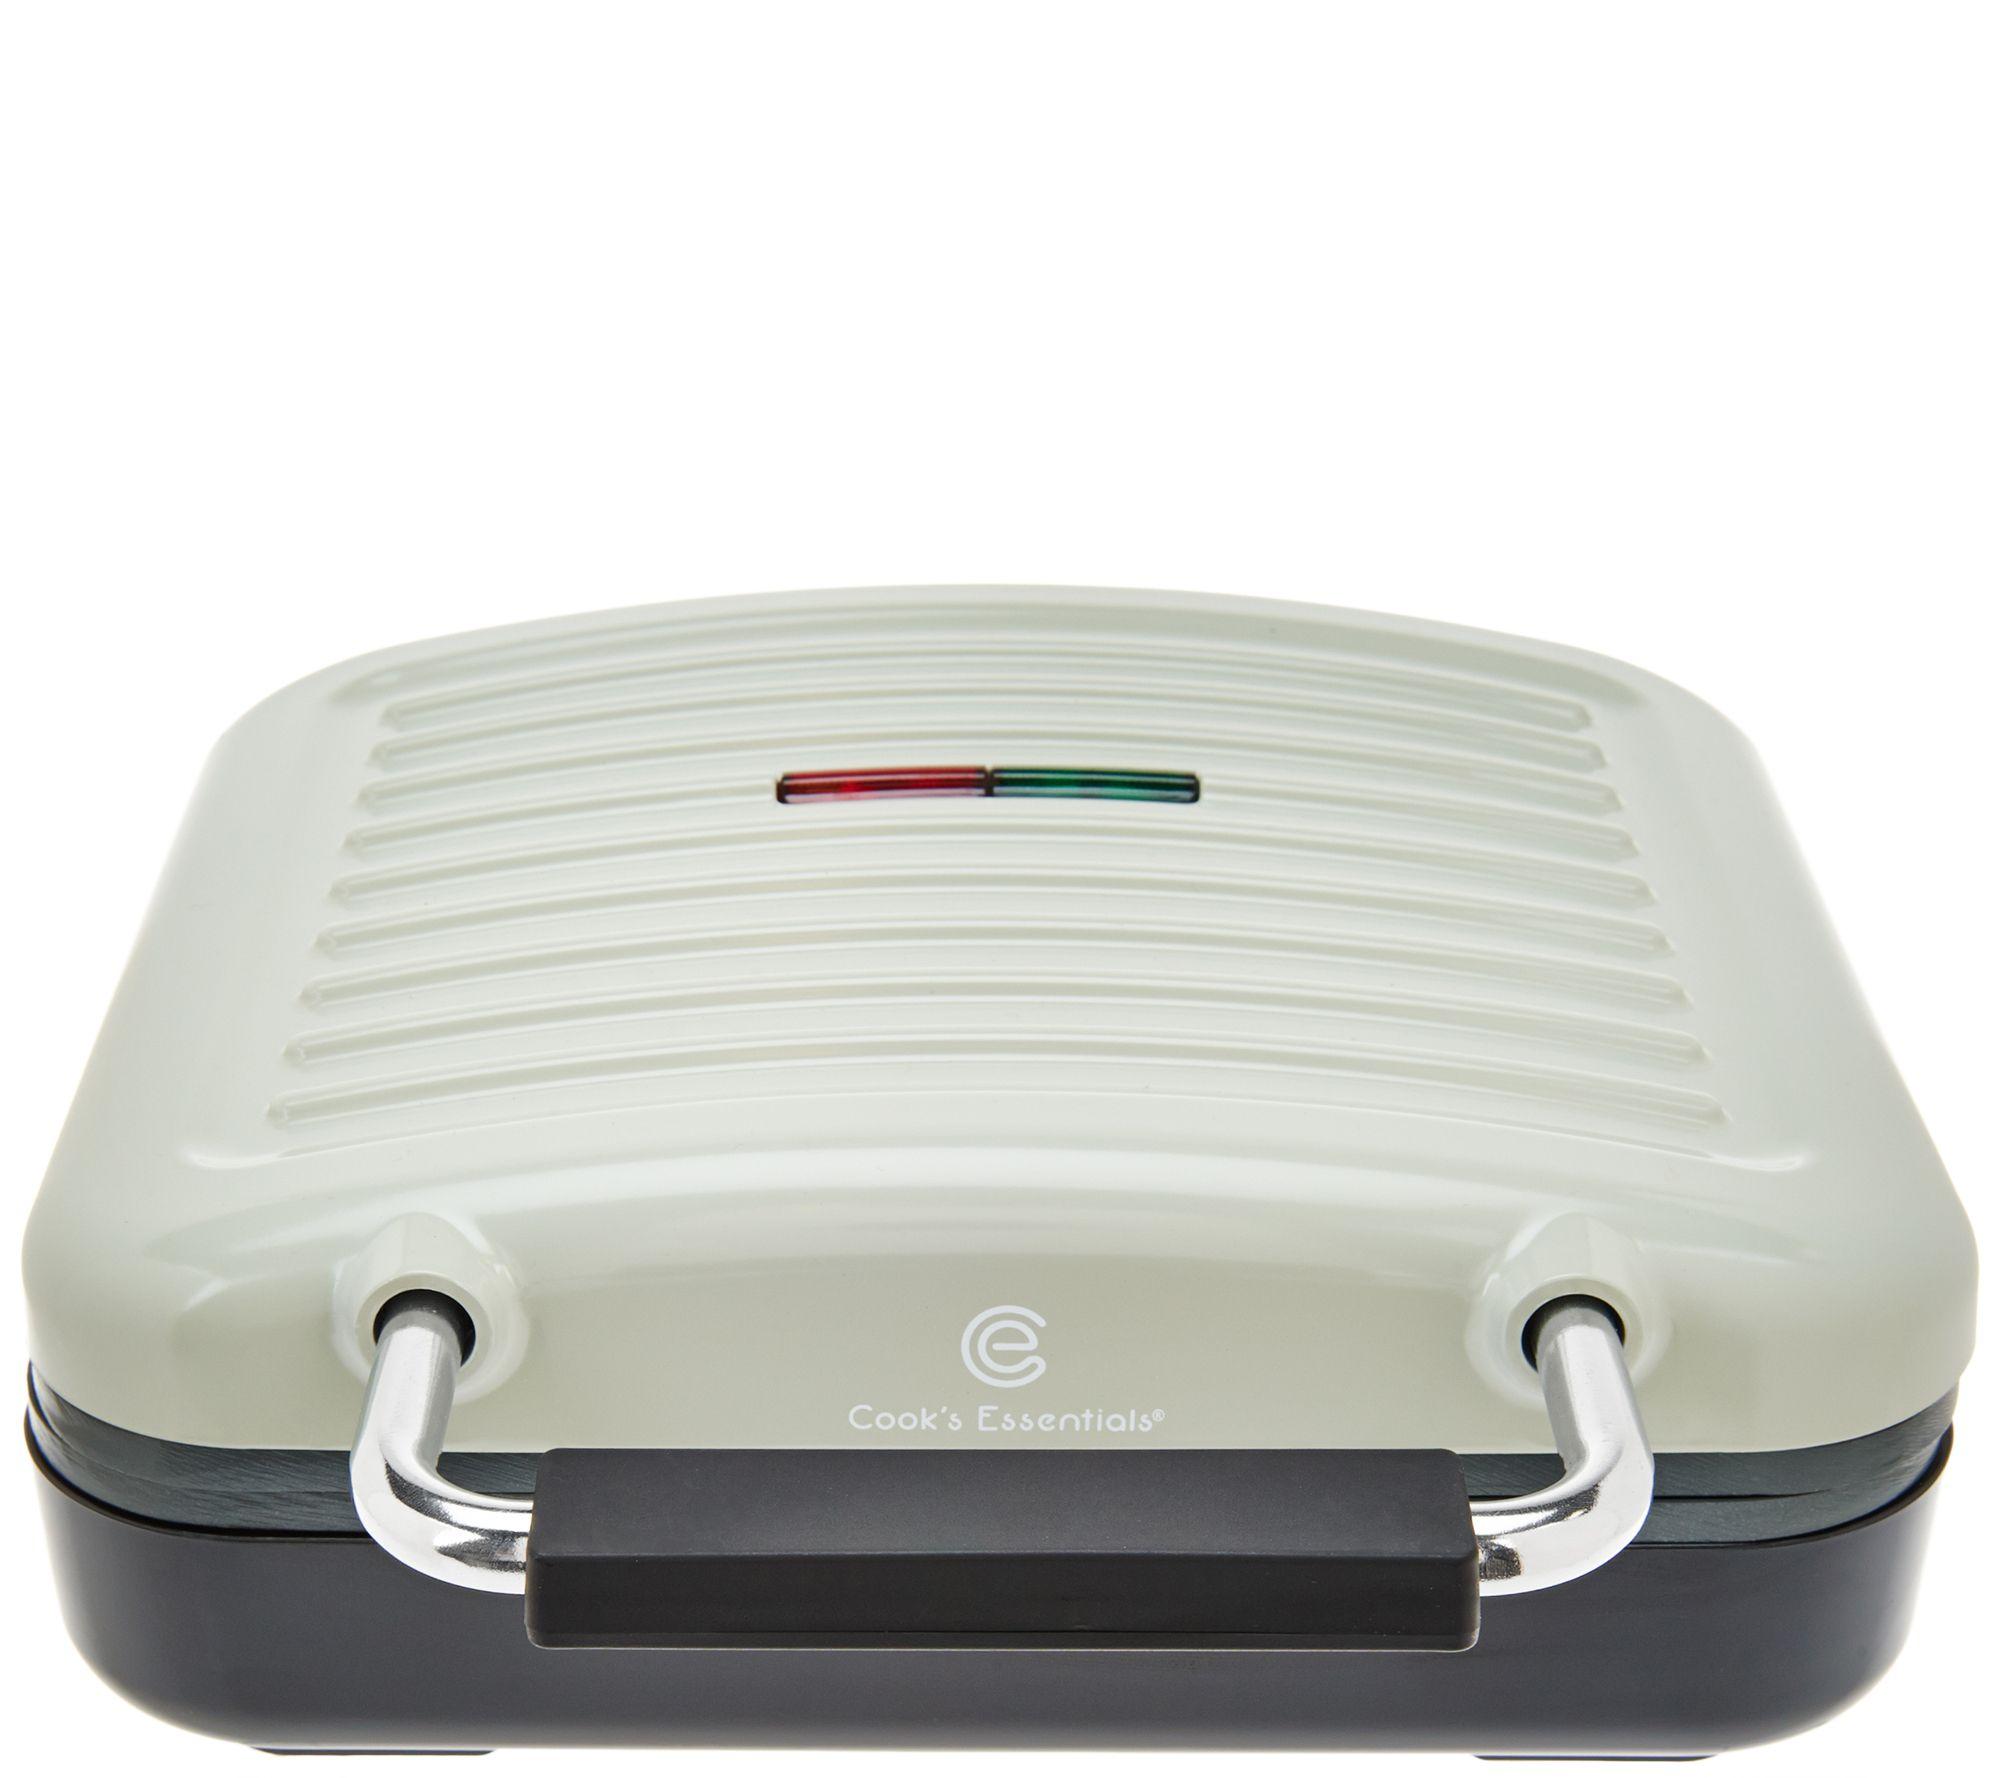 Cooku0027s Essentials 1400 Watt Steam Grill w/ Ceramic Plates - Page 1 u2014 QVC.com  sc 1 st  QVC.com & Cooku0027s Essentials 1400 Watt Steam Grill w/ Ceramic Plates - Page 1 ...